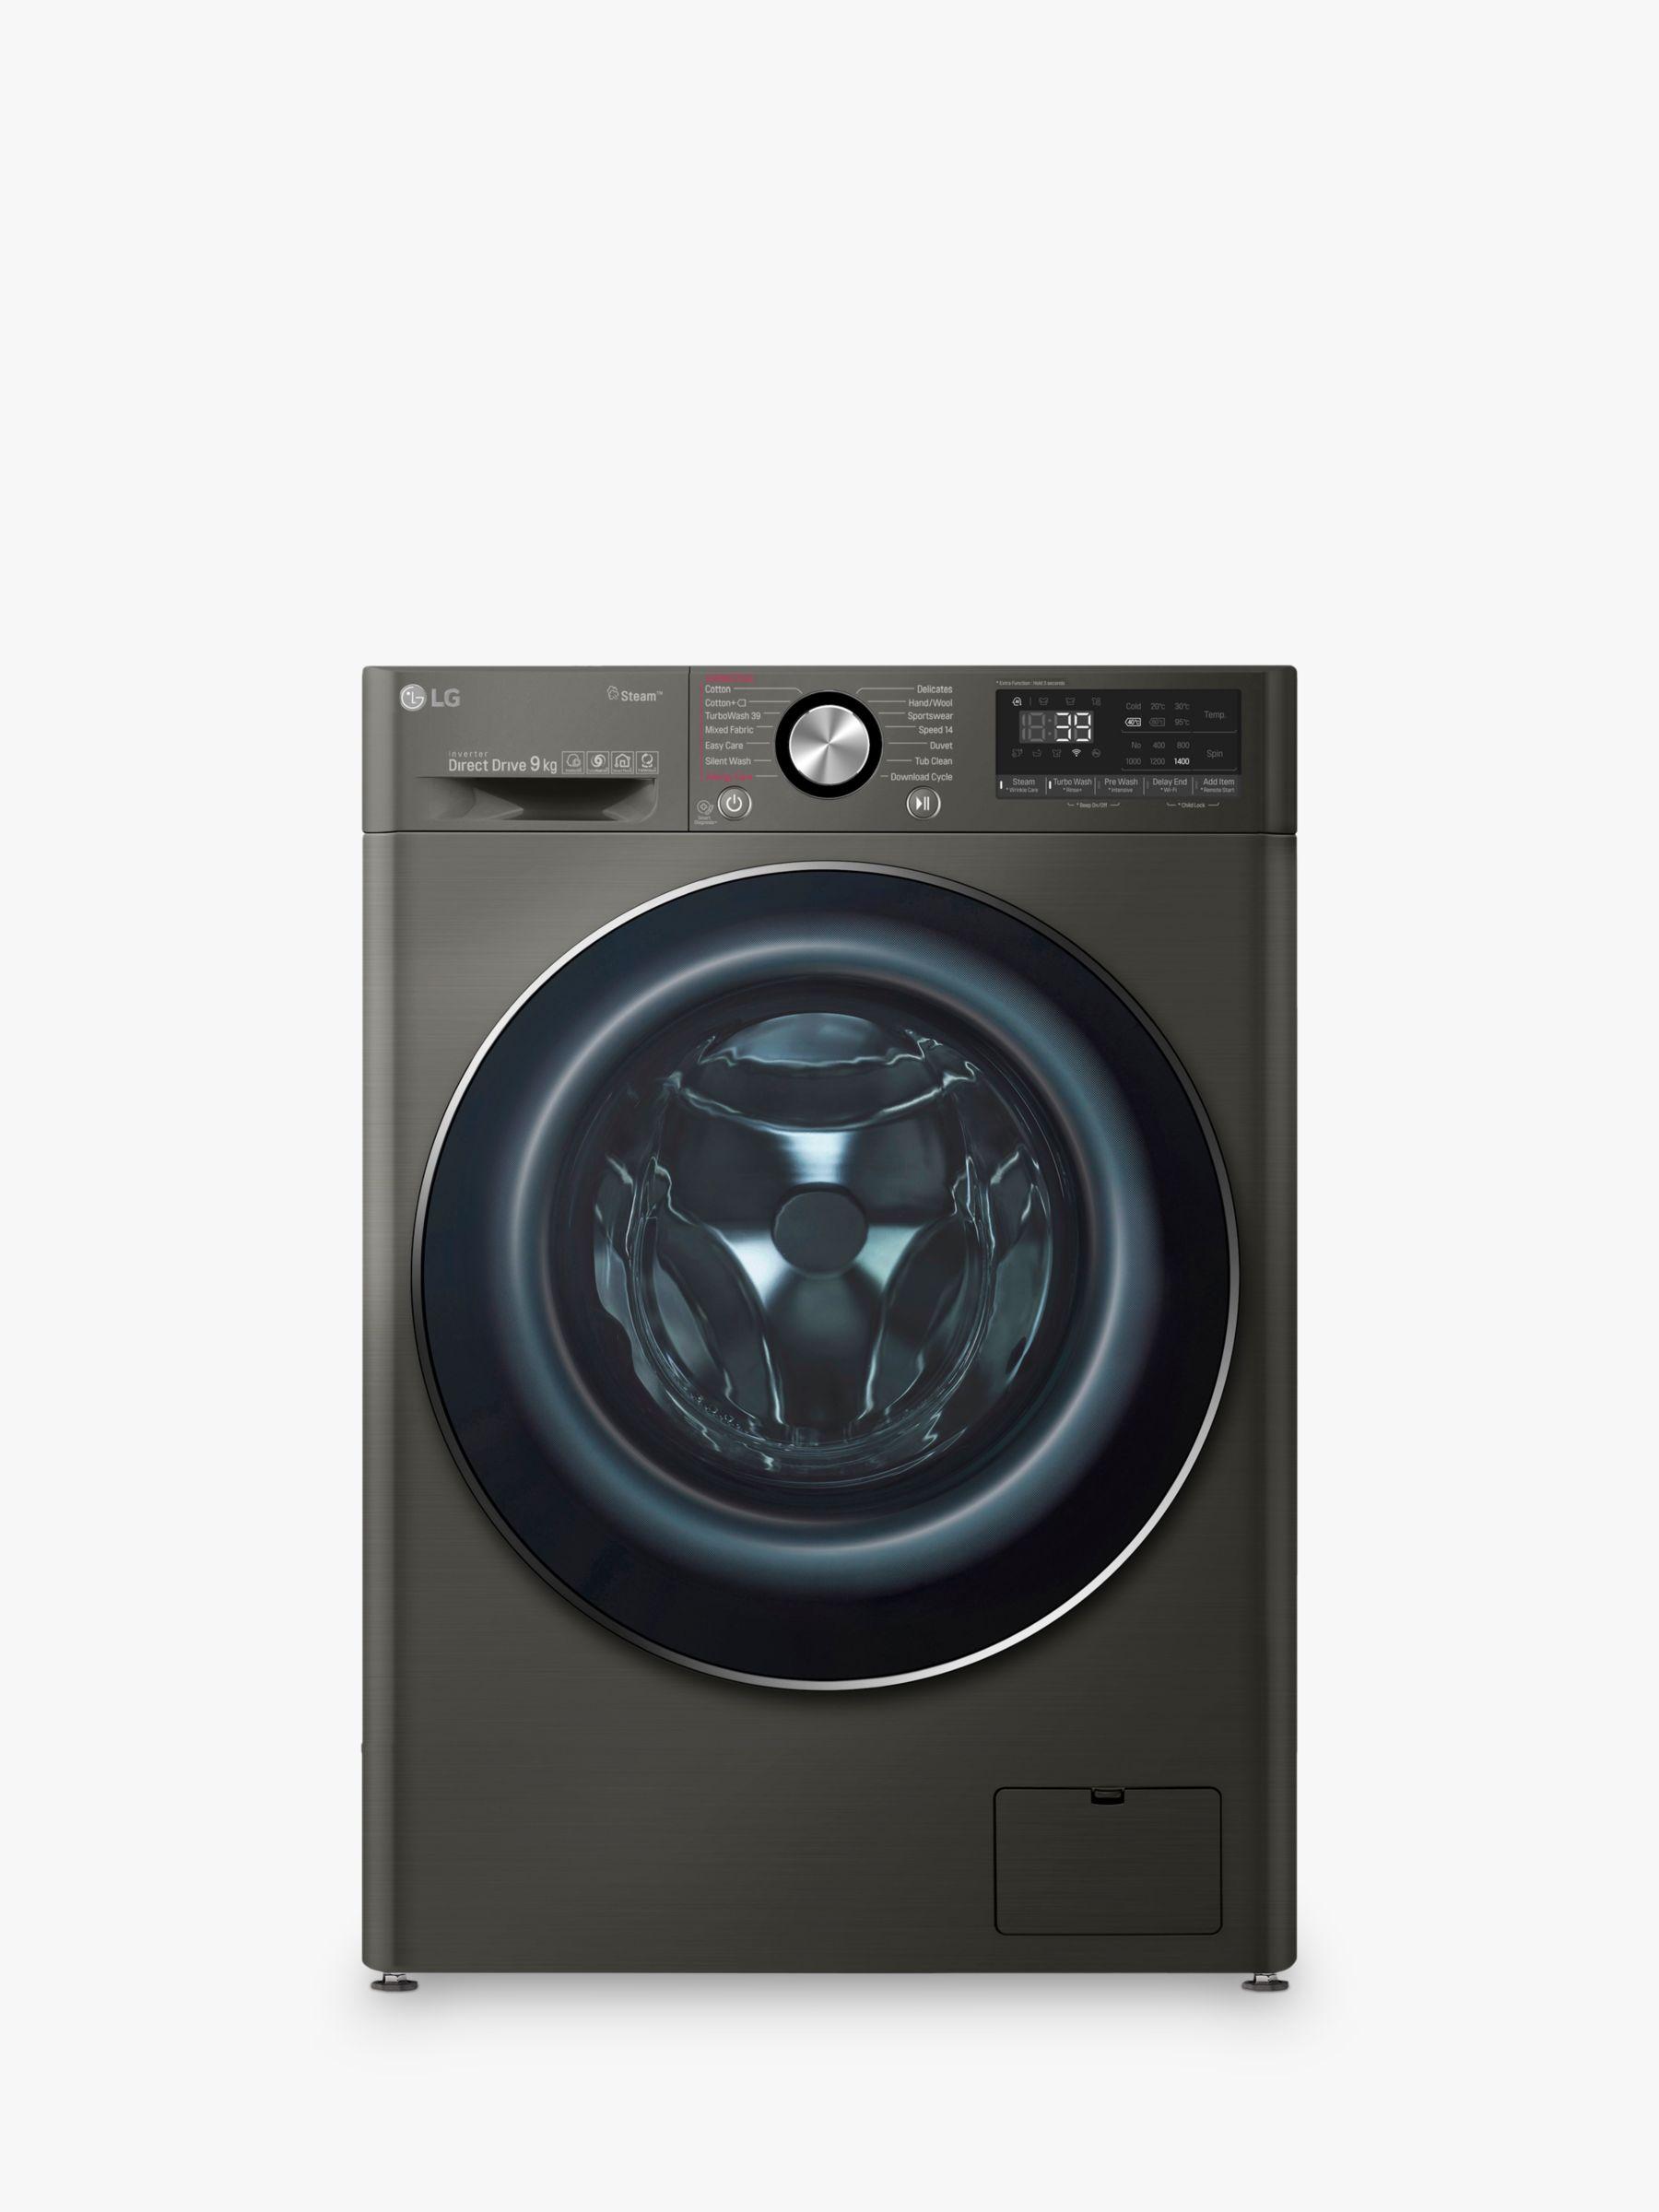 LG LG F4V909BTS Freestanding Washing Machine, 9kg Load, A+++ Energy Rating, 1400rpm Spin, Black